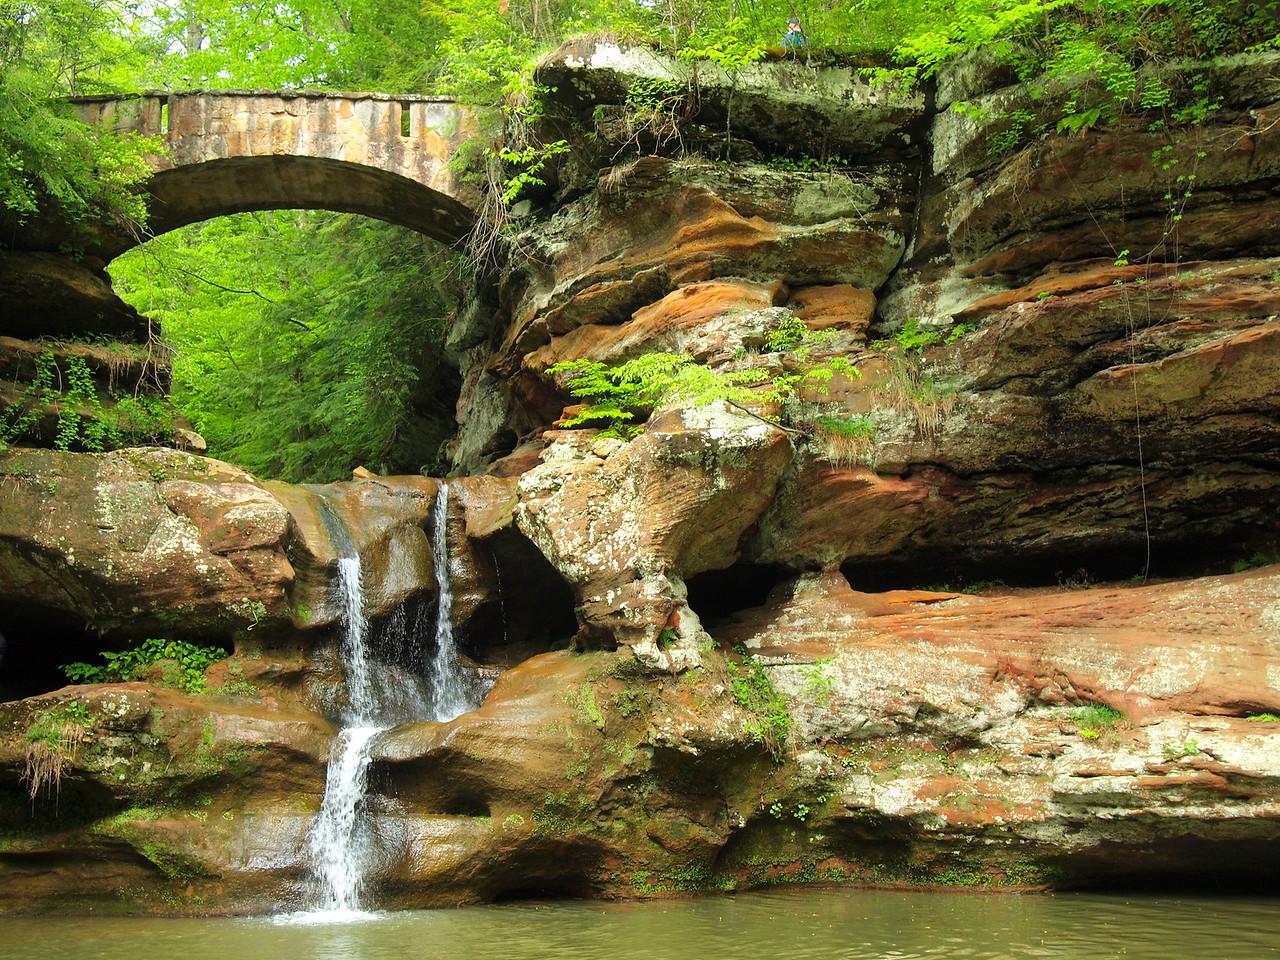 Upper Falls in Hocking Hills State Park